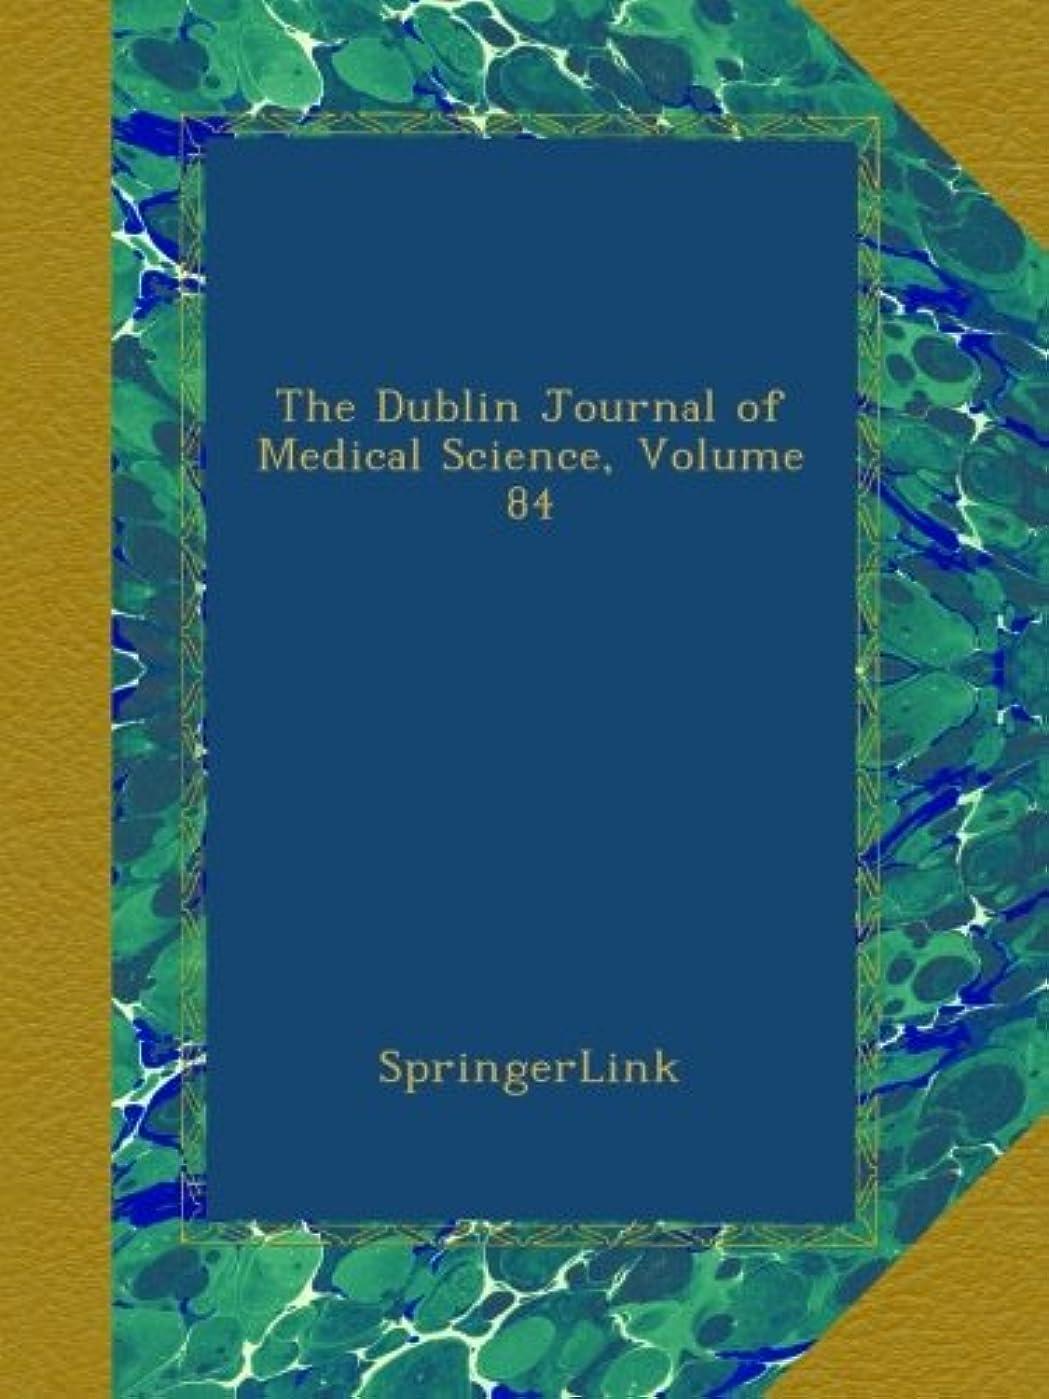 西下手者The Dublin Journal of Medical Science, Volume 84